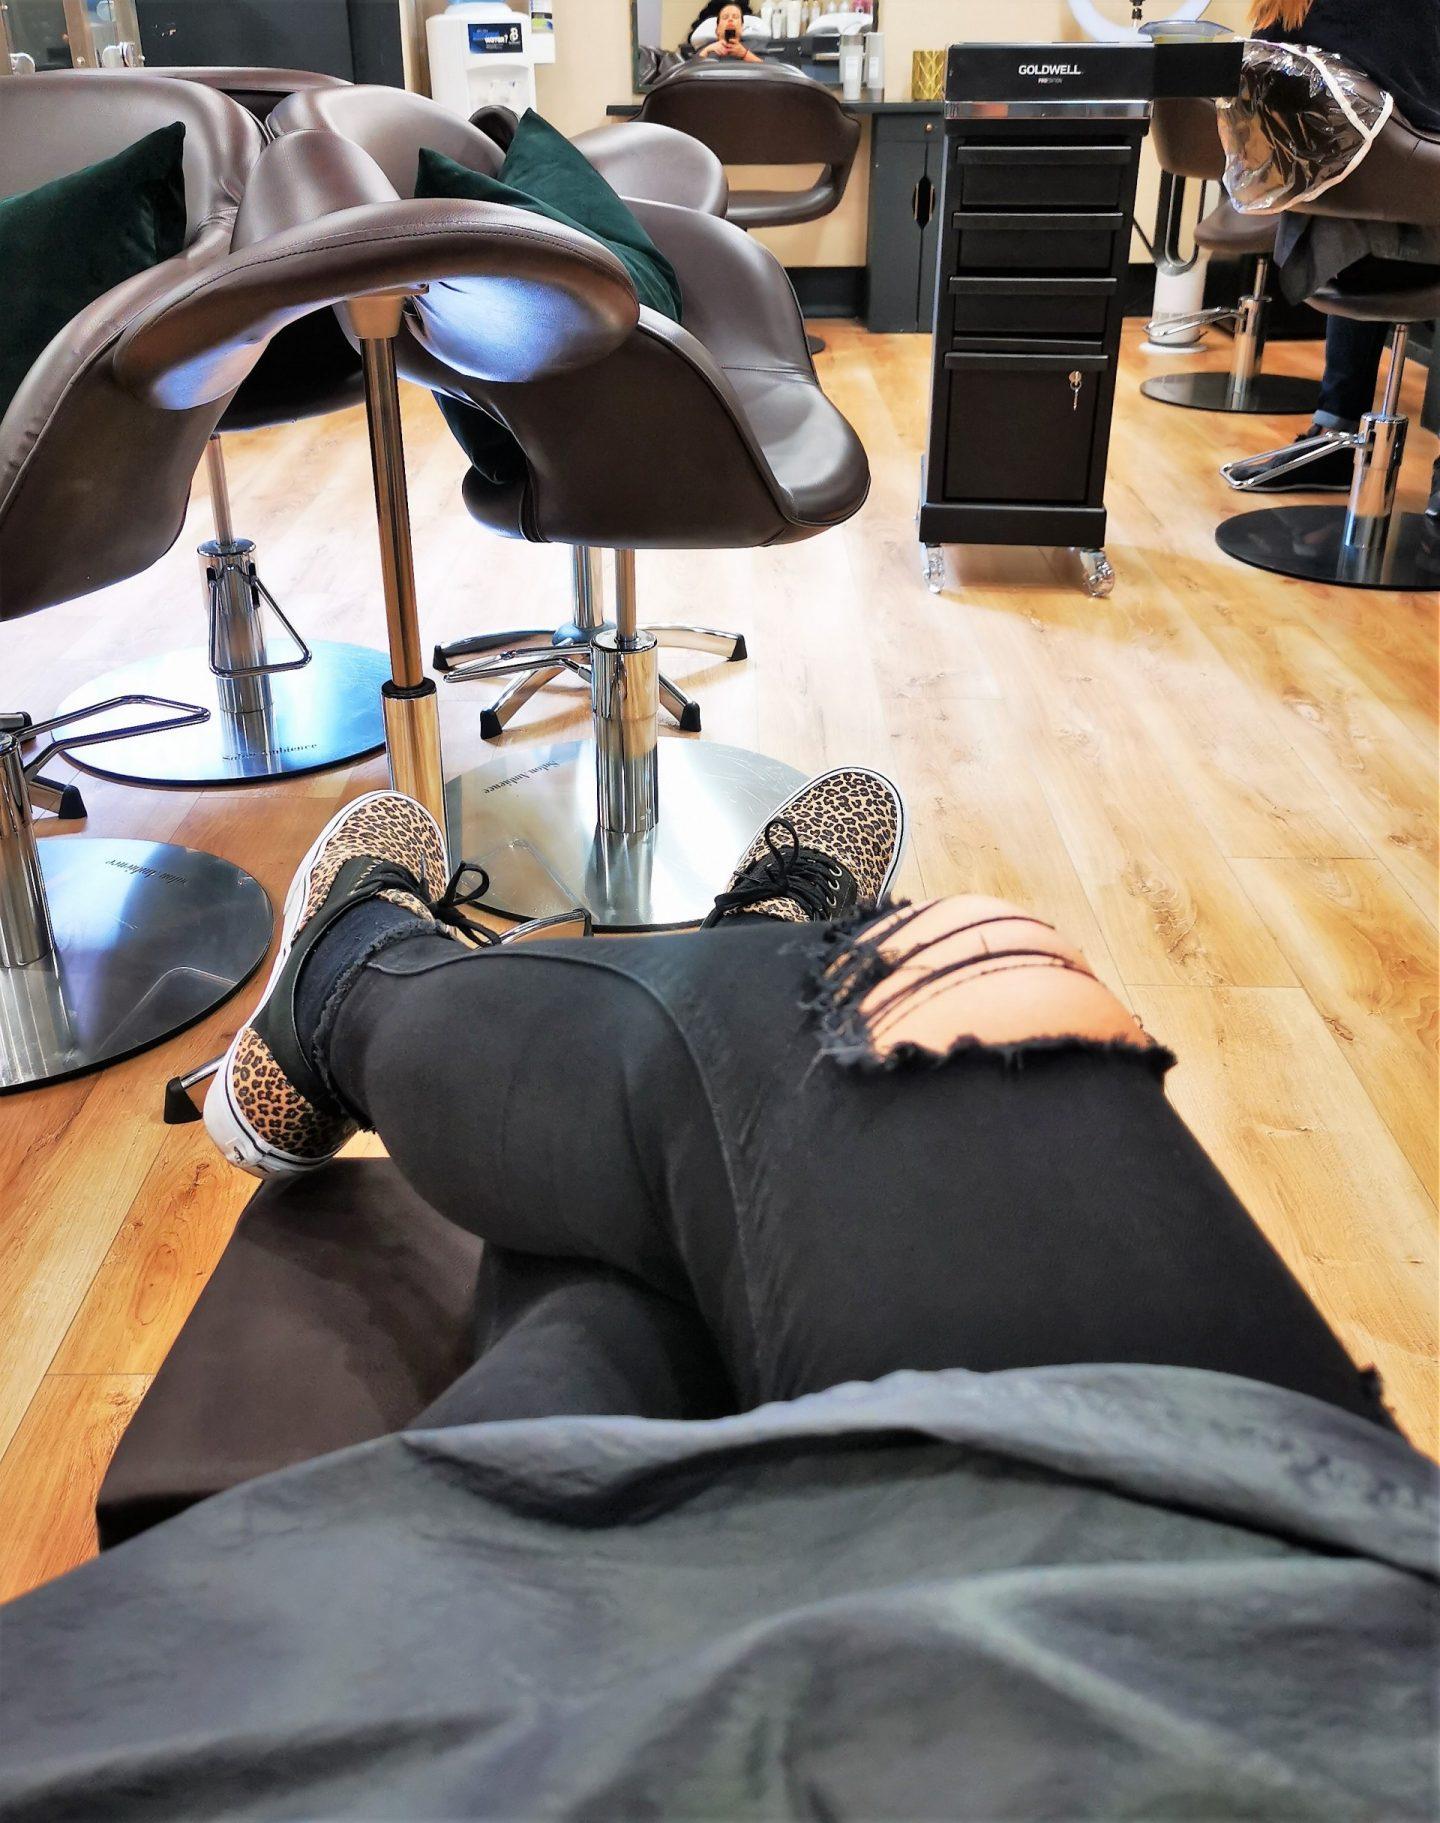 Massage chairs David Marshall